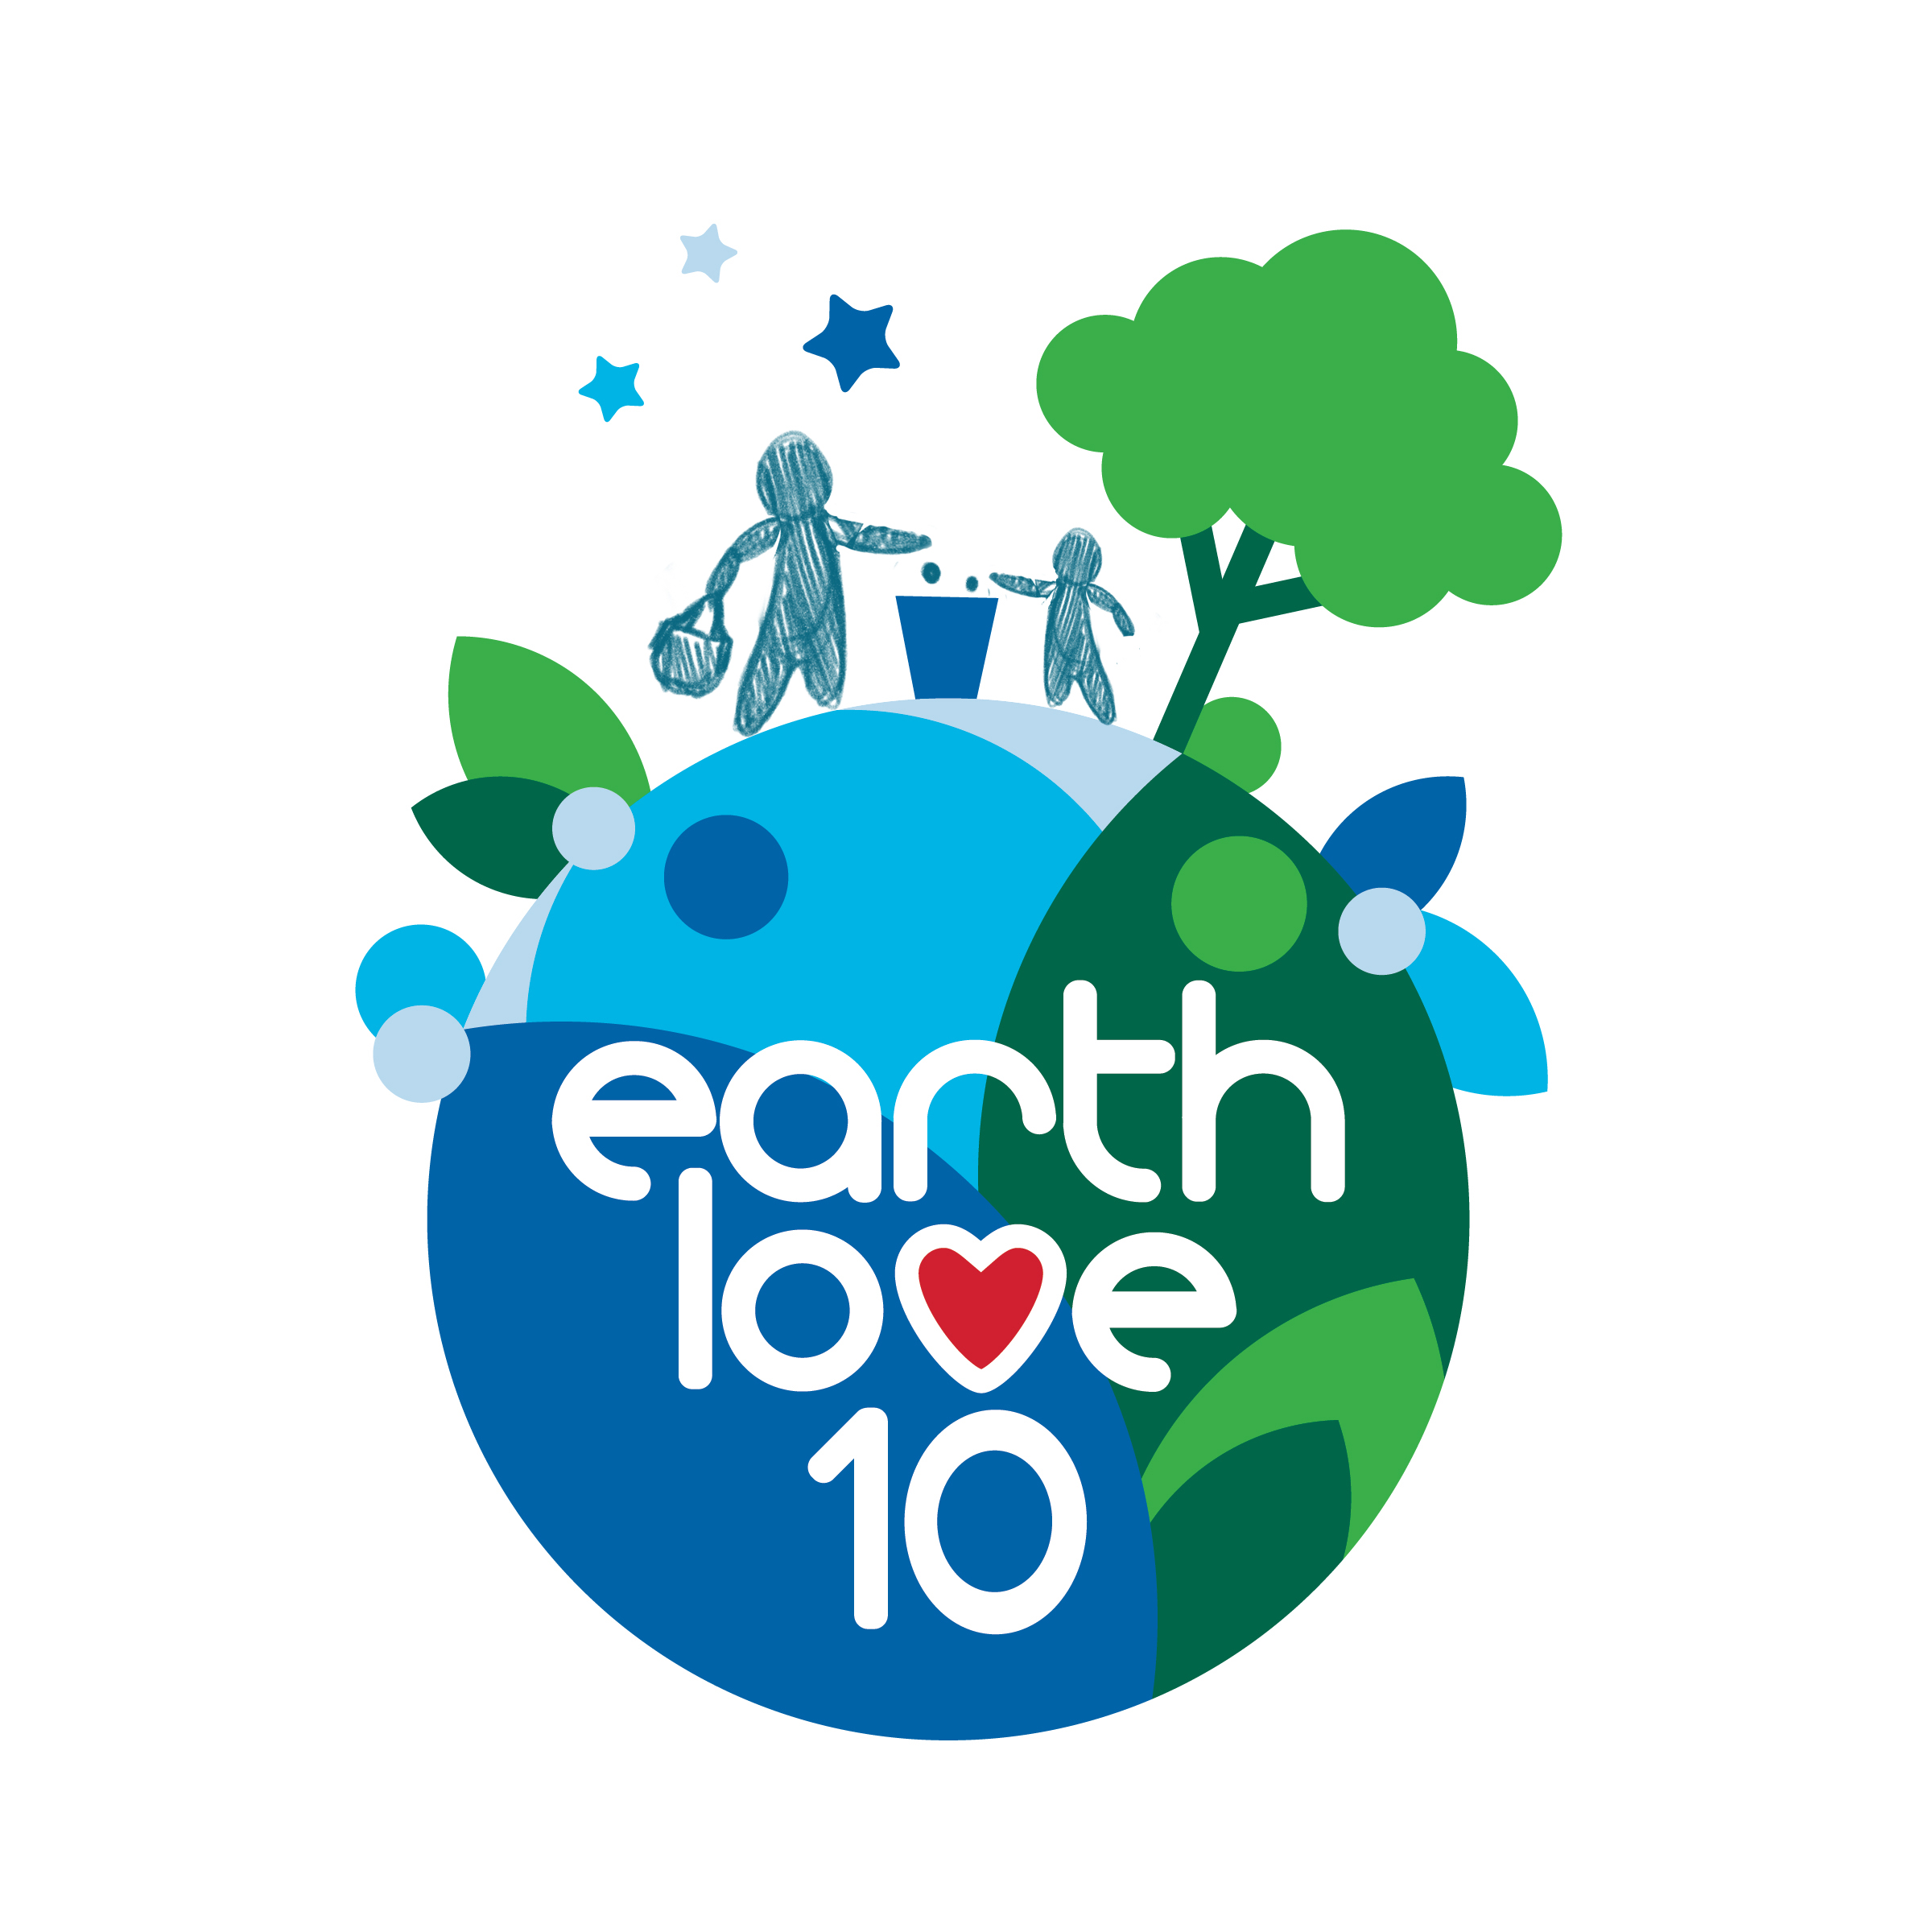 Earth Love 10 Concepts-01.jpg